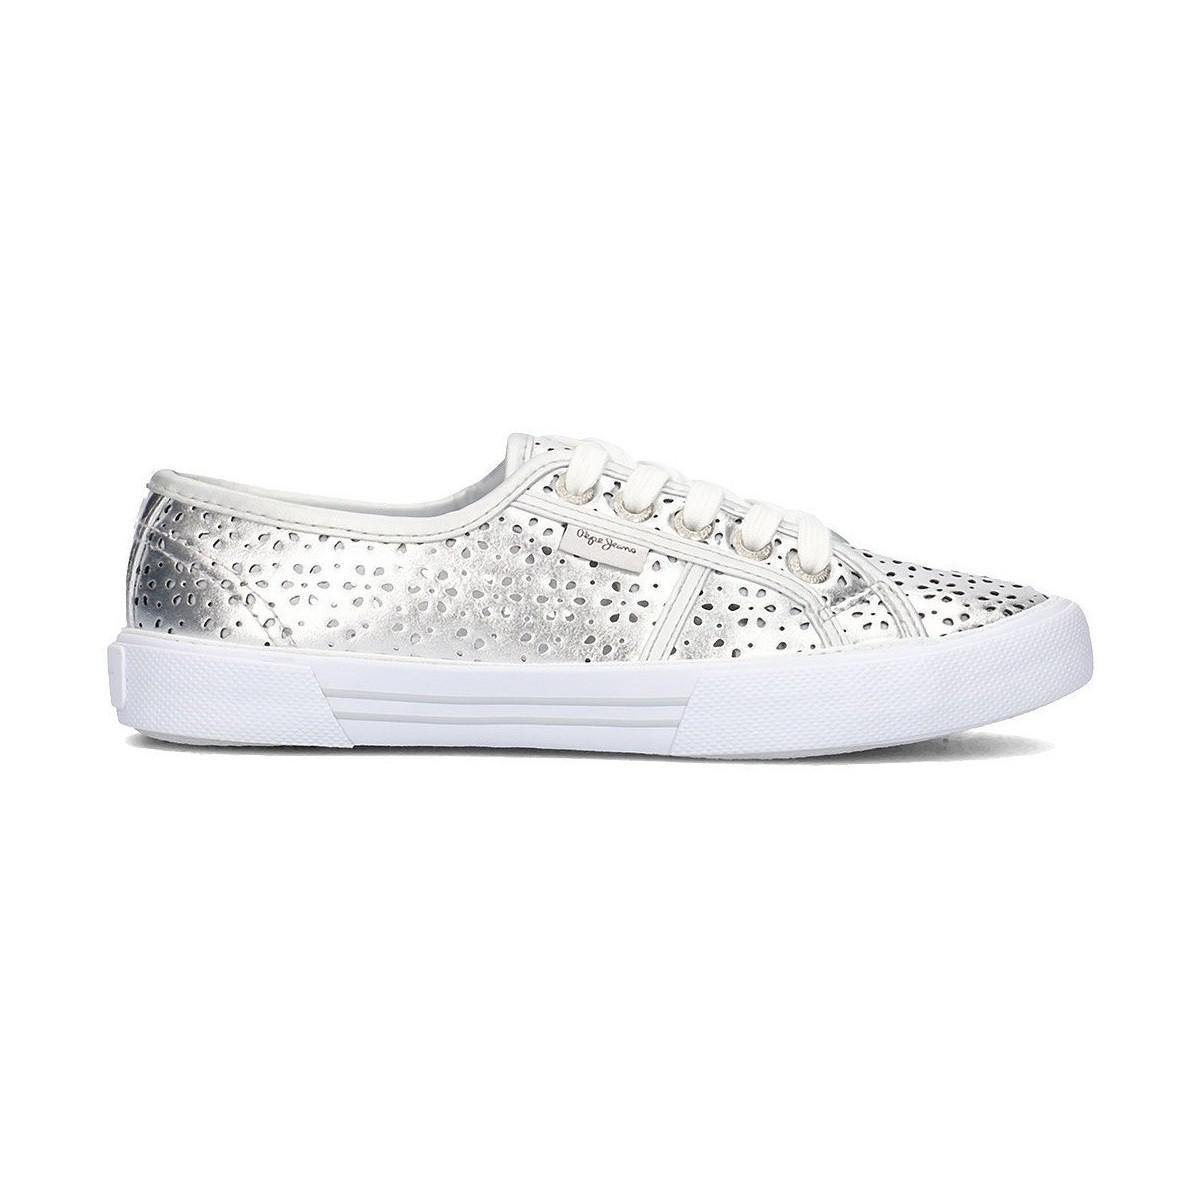 Sneakers Pepe Jeans Pls30643 fO86cX8kLQ